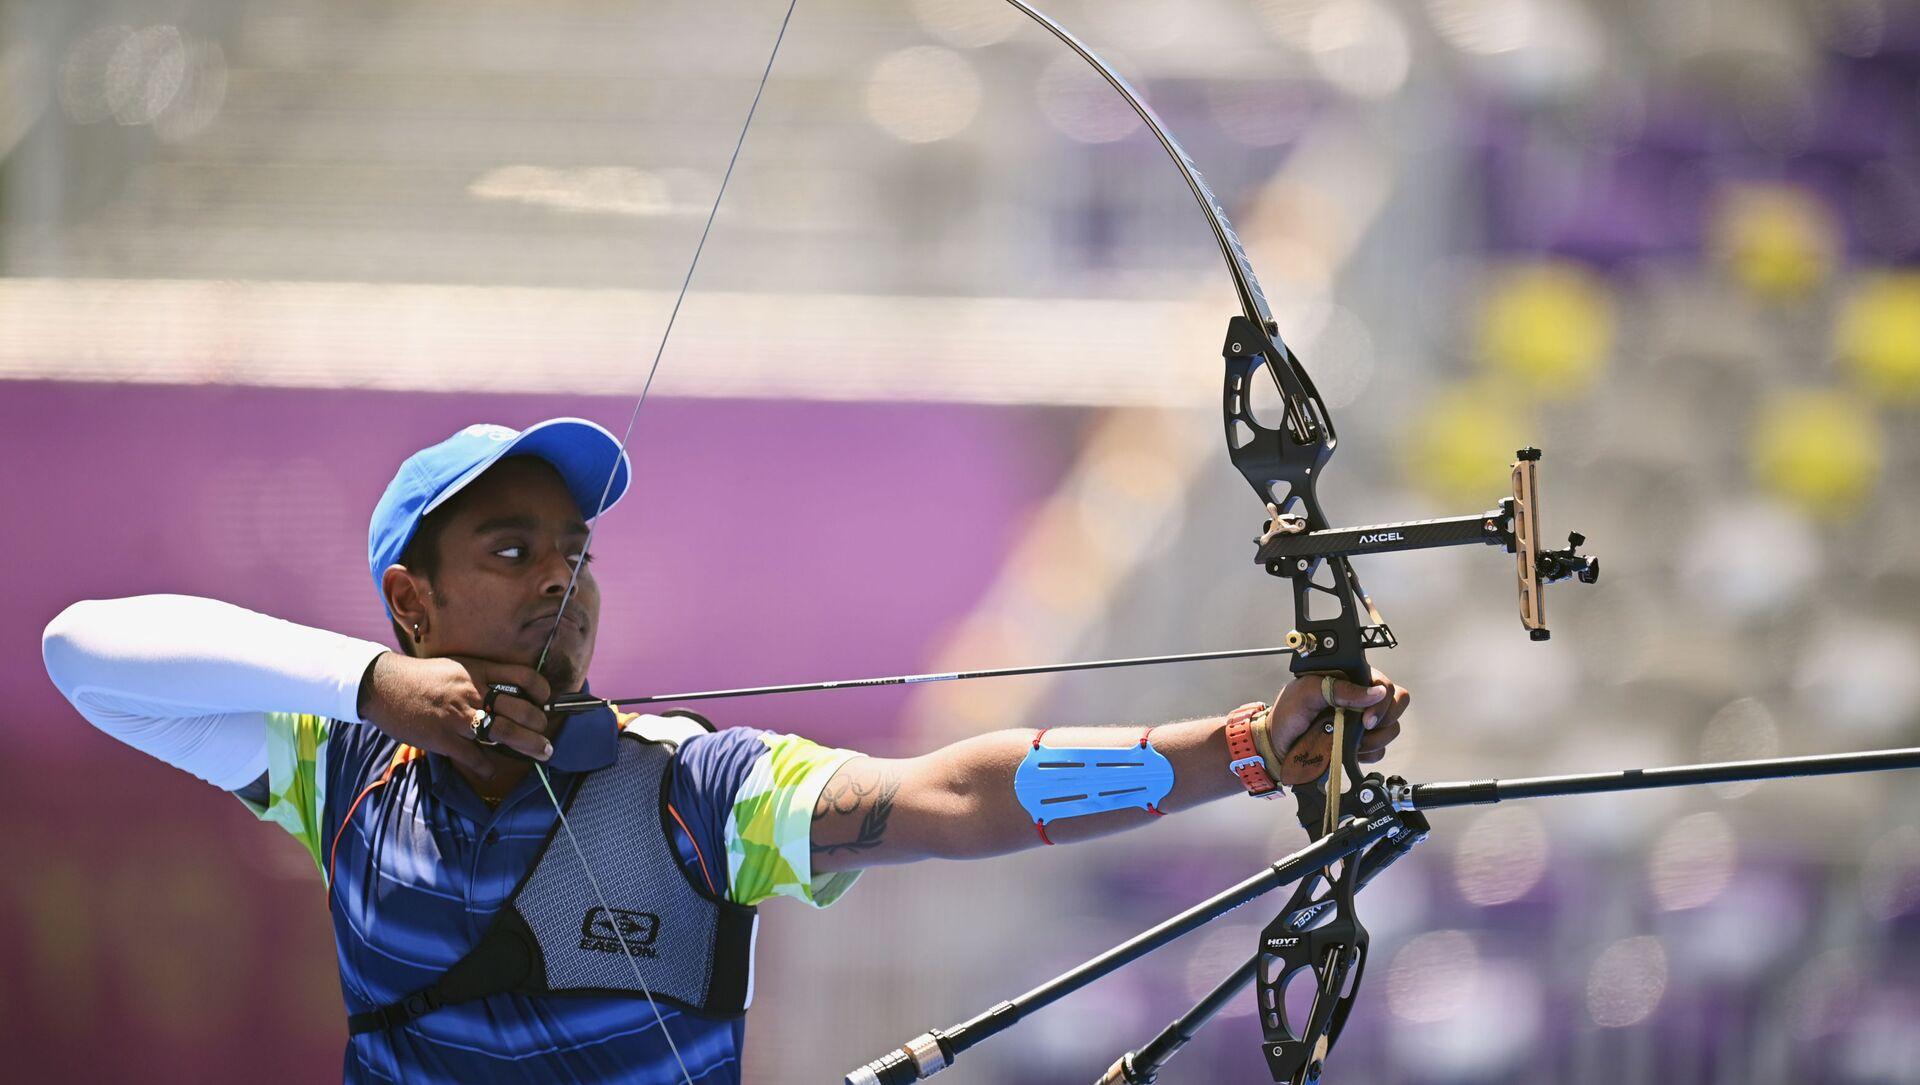 Tokyo 2020 Olympics - Archery - Men's Individual - 1/16 Finals - Yumenoshima Archery Field, Tokyo, Japan - July 29, 2021. Atanu Das of India in action  - Sputnik International, 1920, 29.07.2021